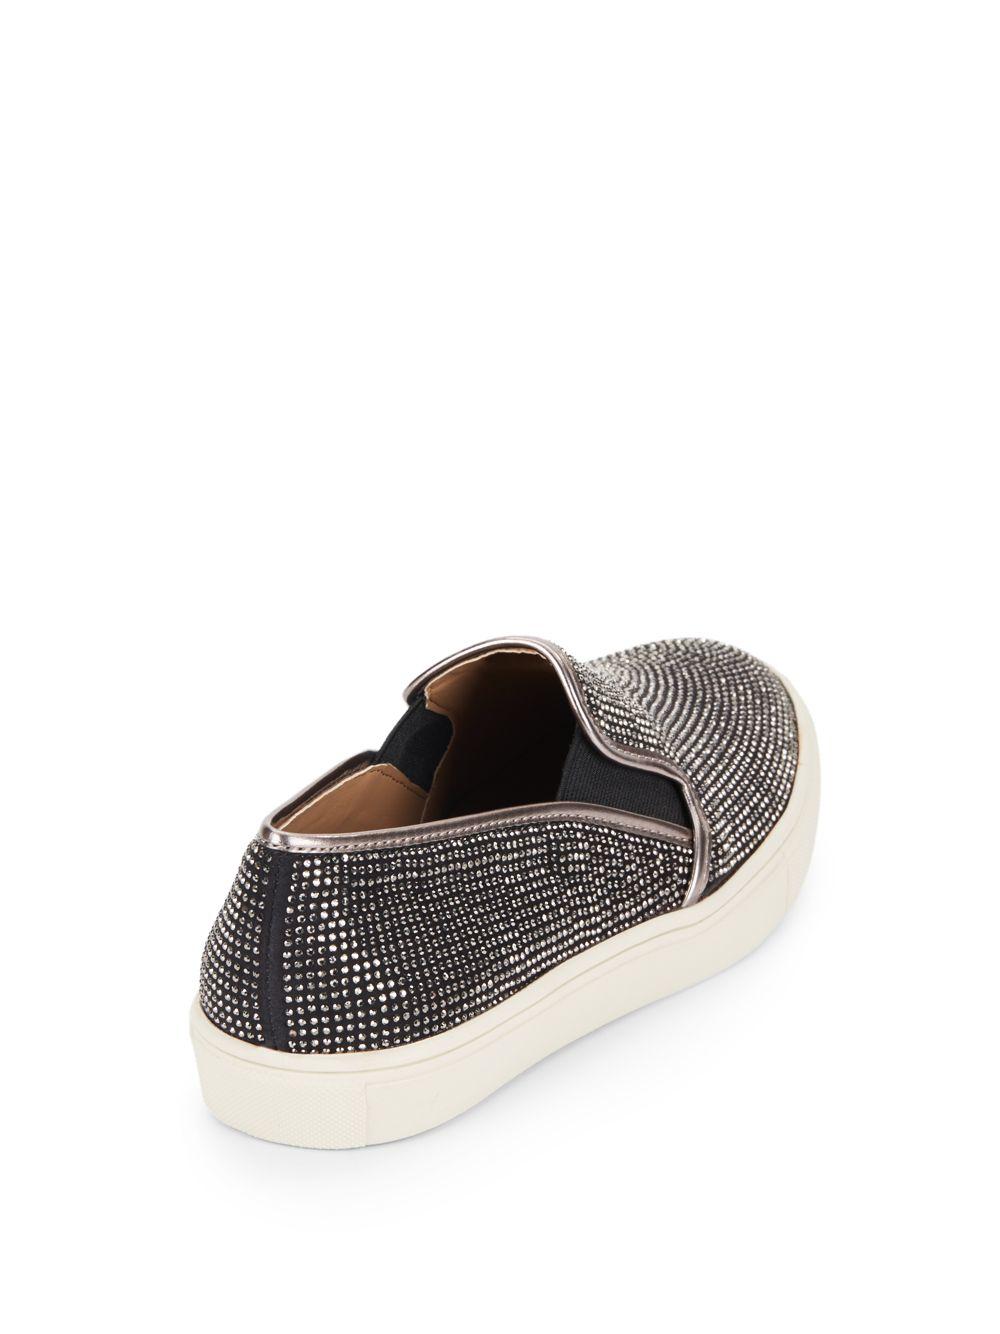 45274ad85d4f Lyst - Steve Madden Exsess Rhinestone Slip-on Sneakers in Black